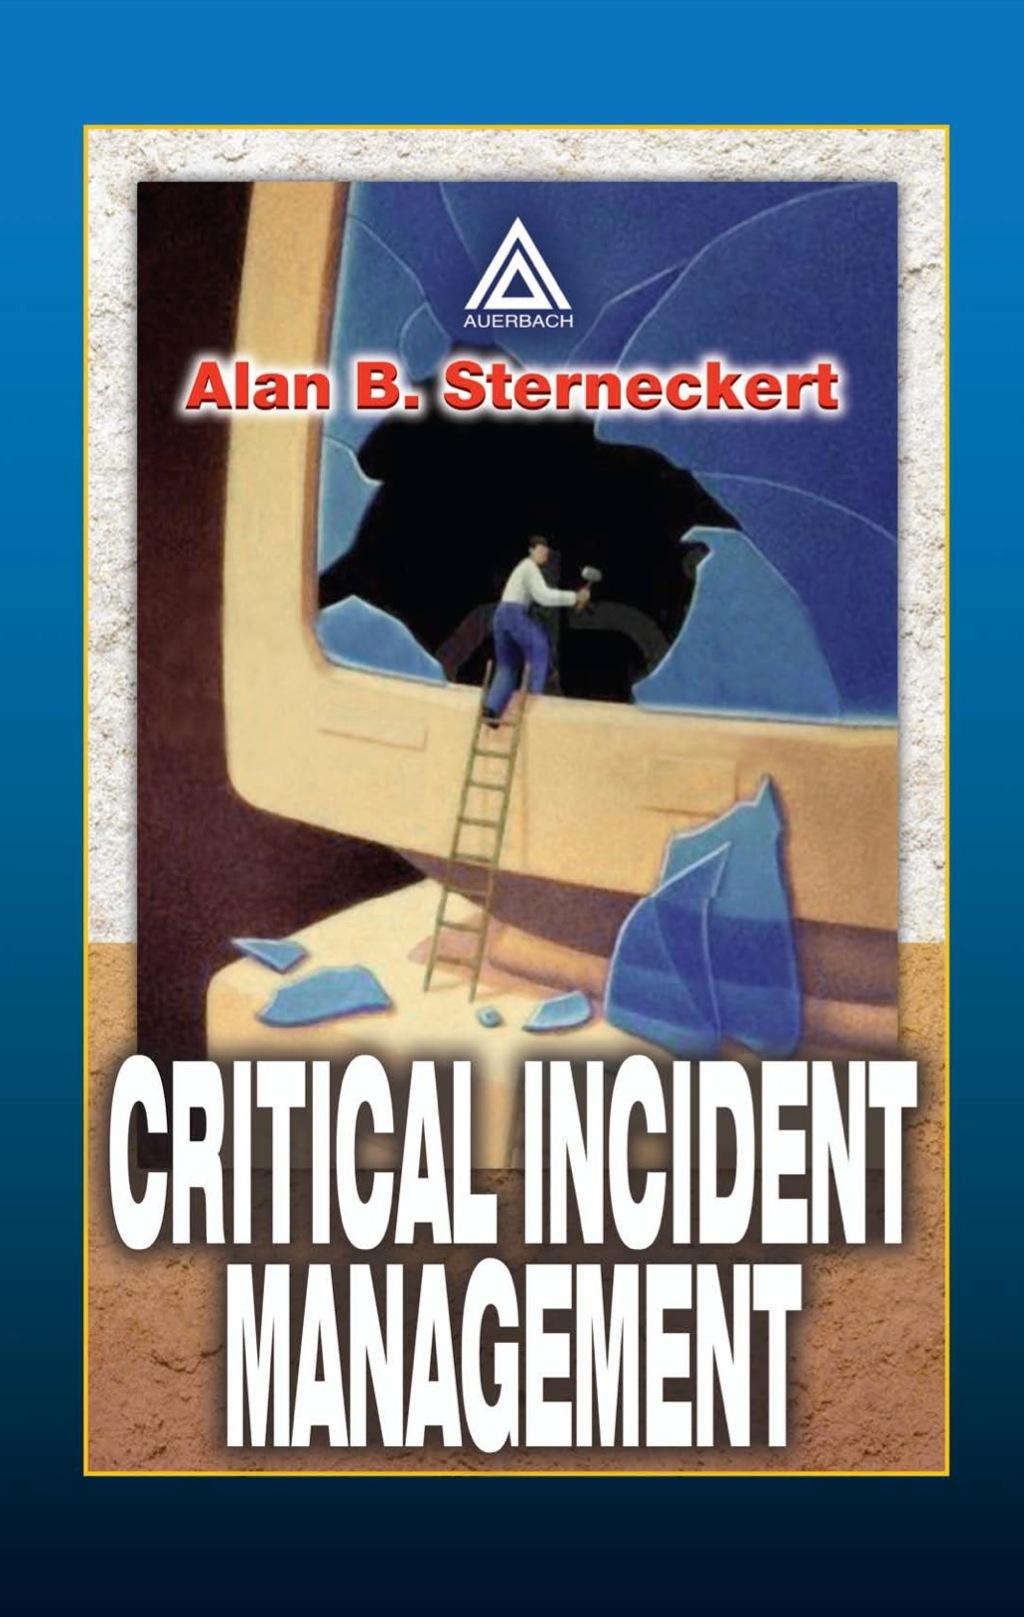 ISBN 9781420000047 product image for Critical Incident Management (eBook Rental) | upcitemdb.com